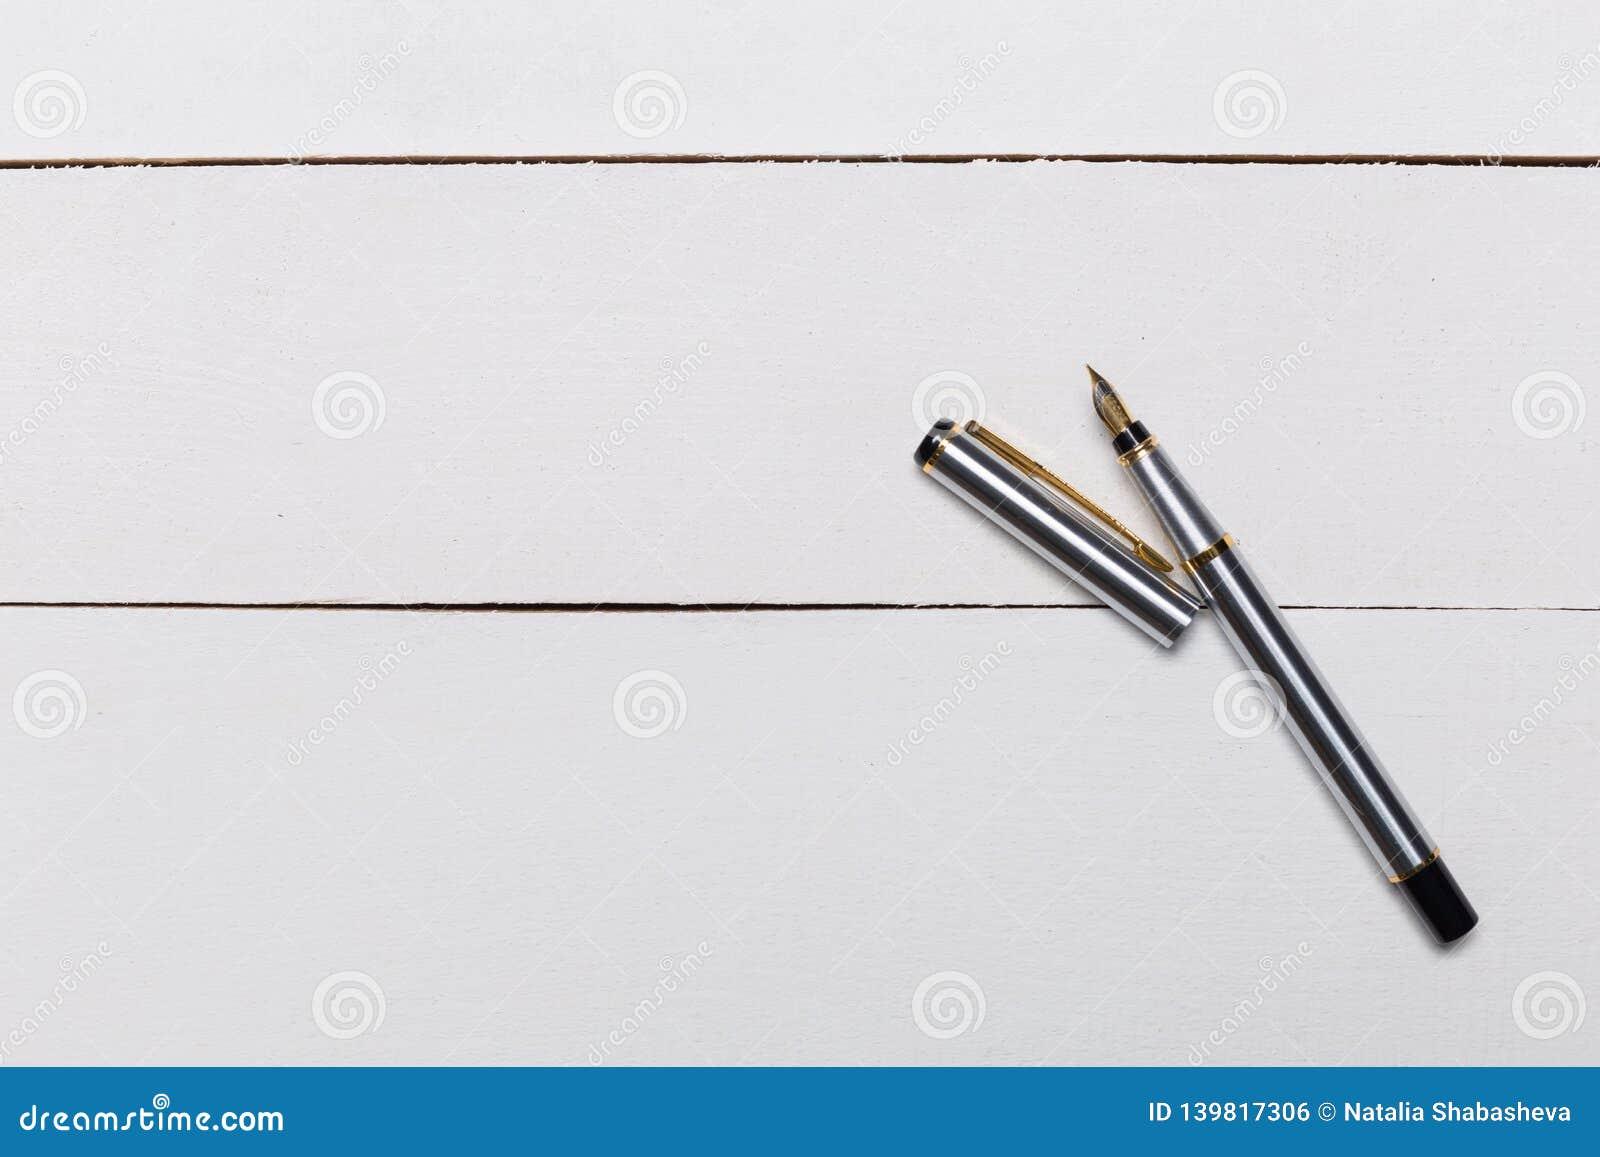 Fountain pen on white wooden background